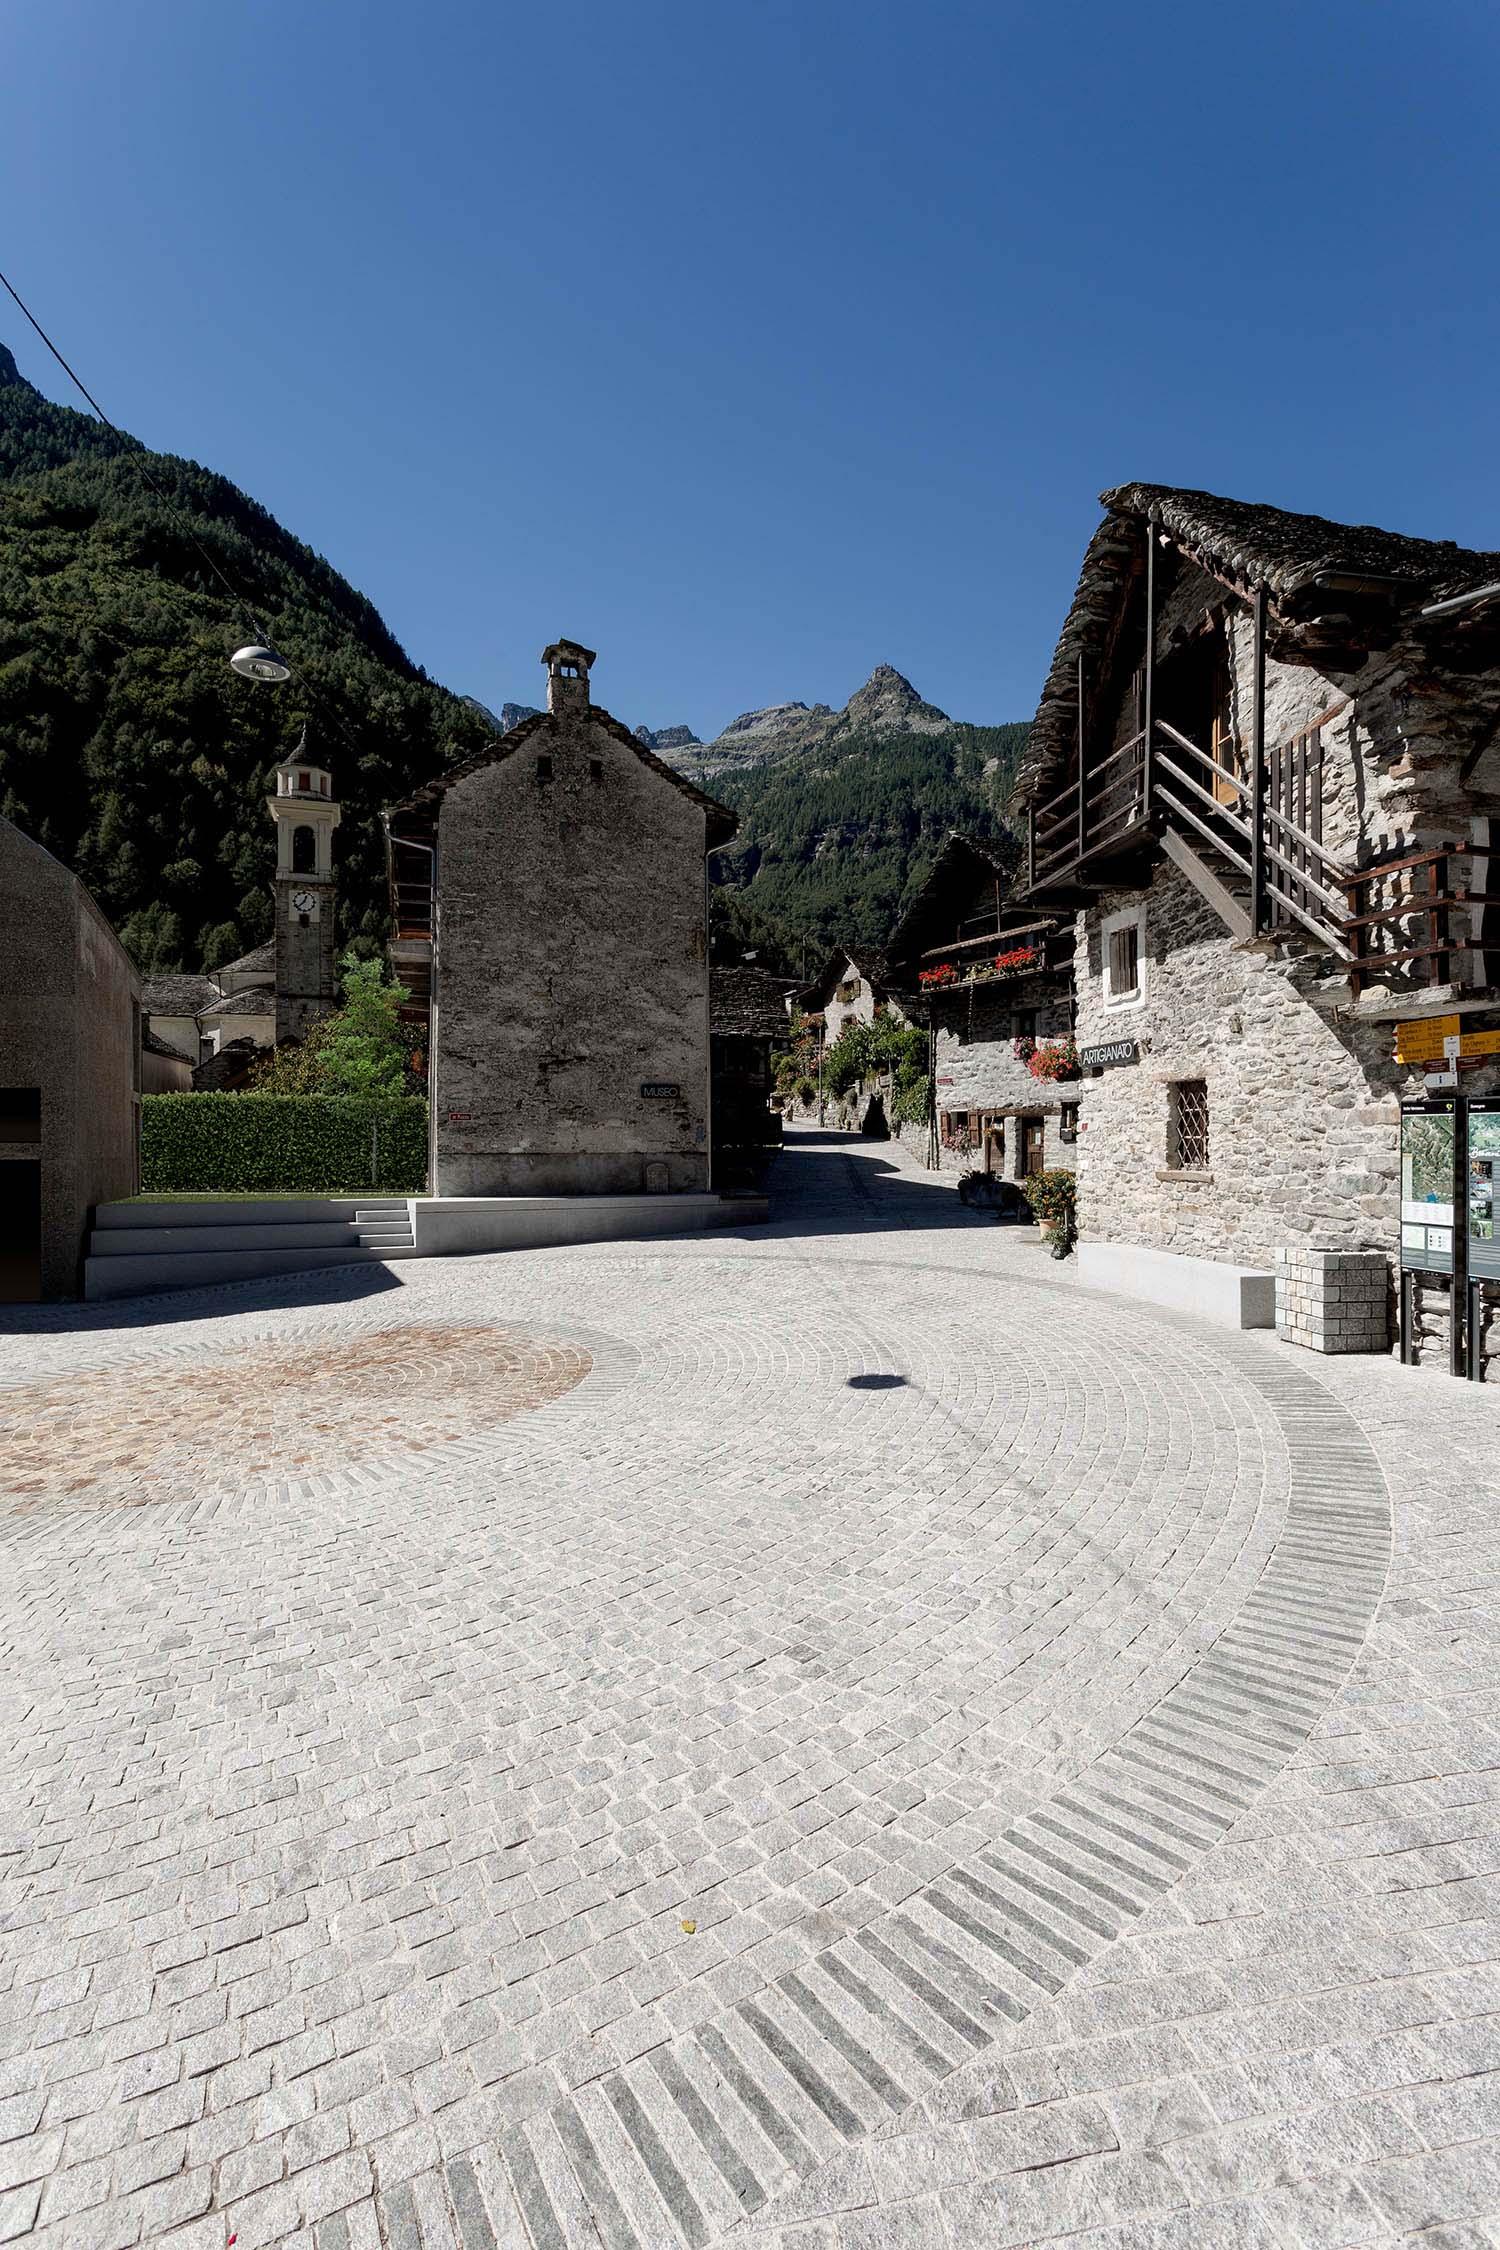 View of the main square Alberto Canepa